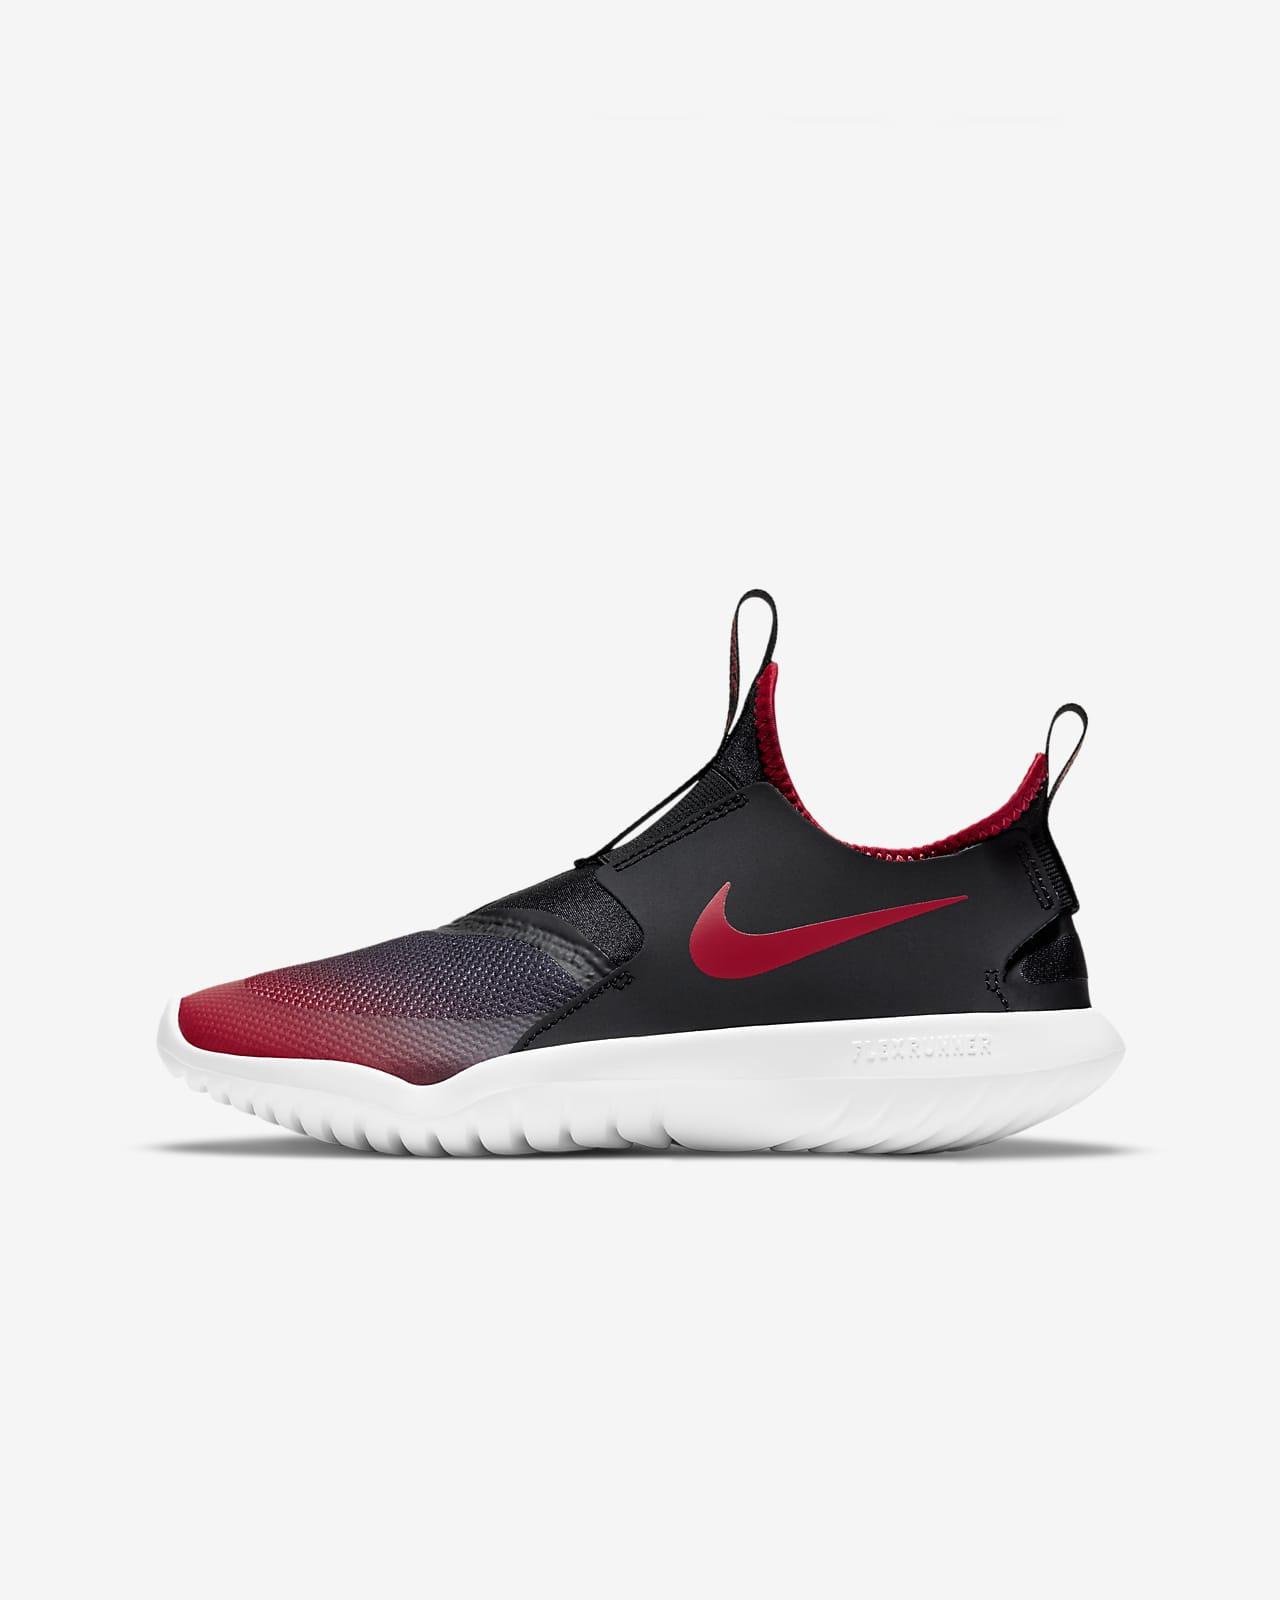 Calzado de running Nike Flex Runner para niños talla grande